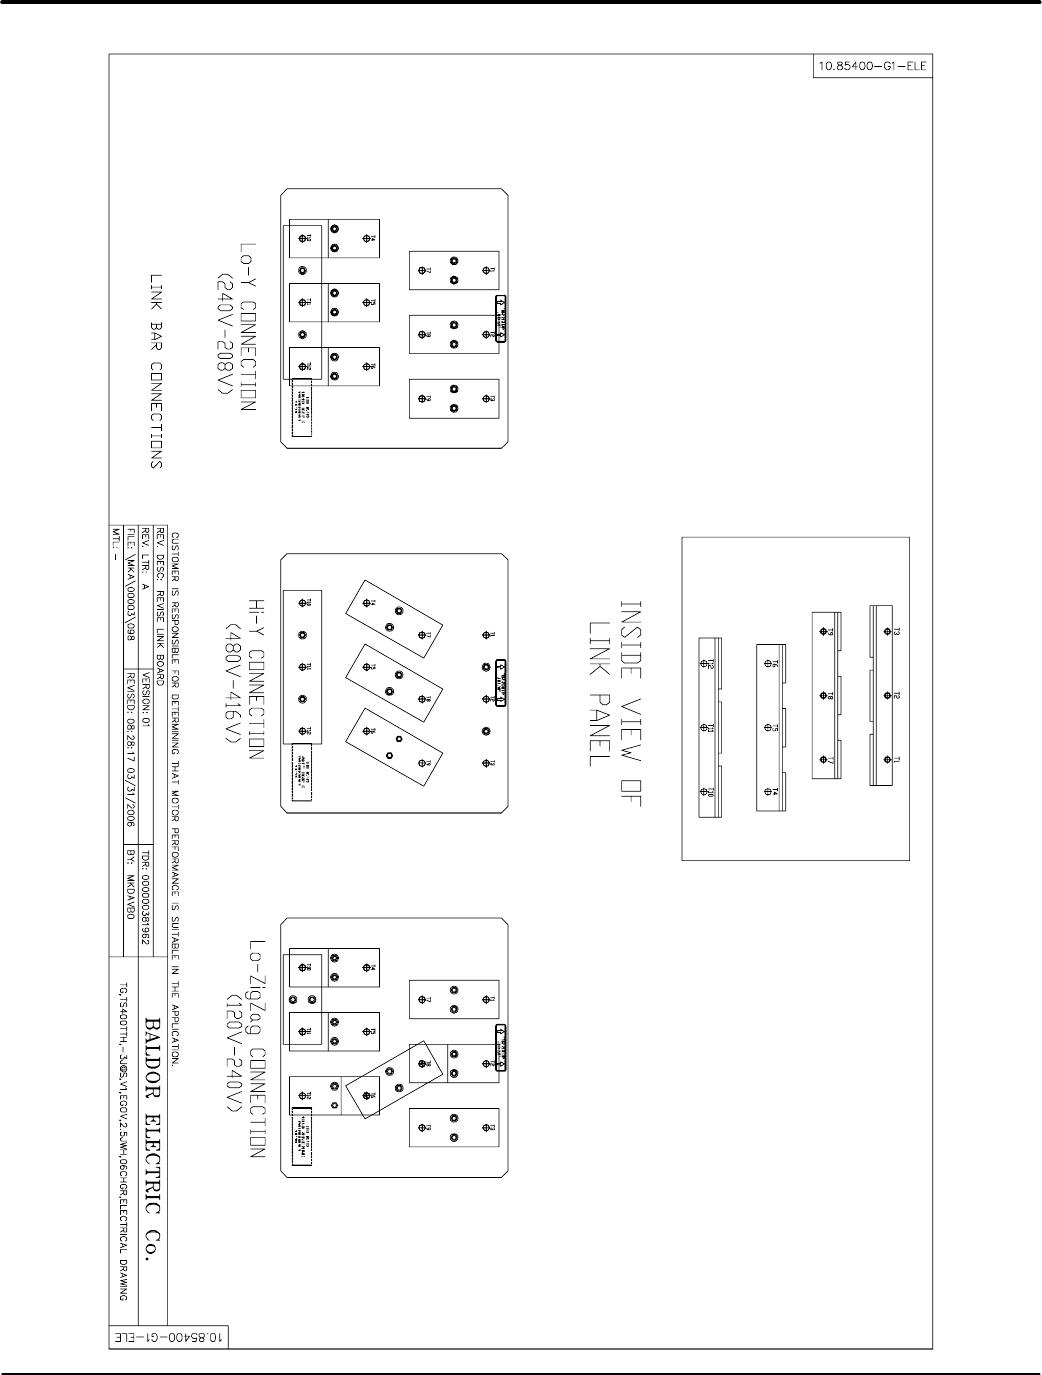 bg54 baldor ts130, ts175, ts25, ts250, ts35, ts400, ts45, ts60, ts80